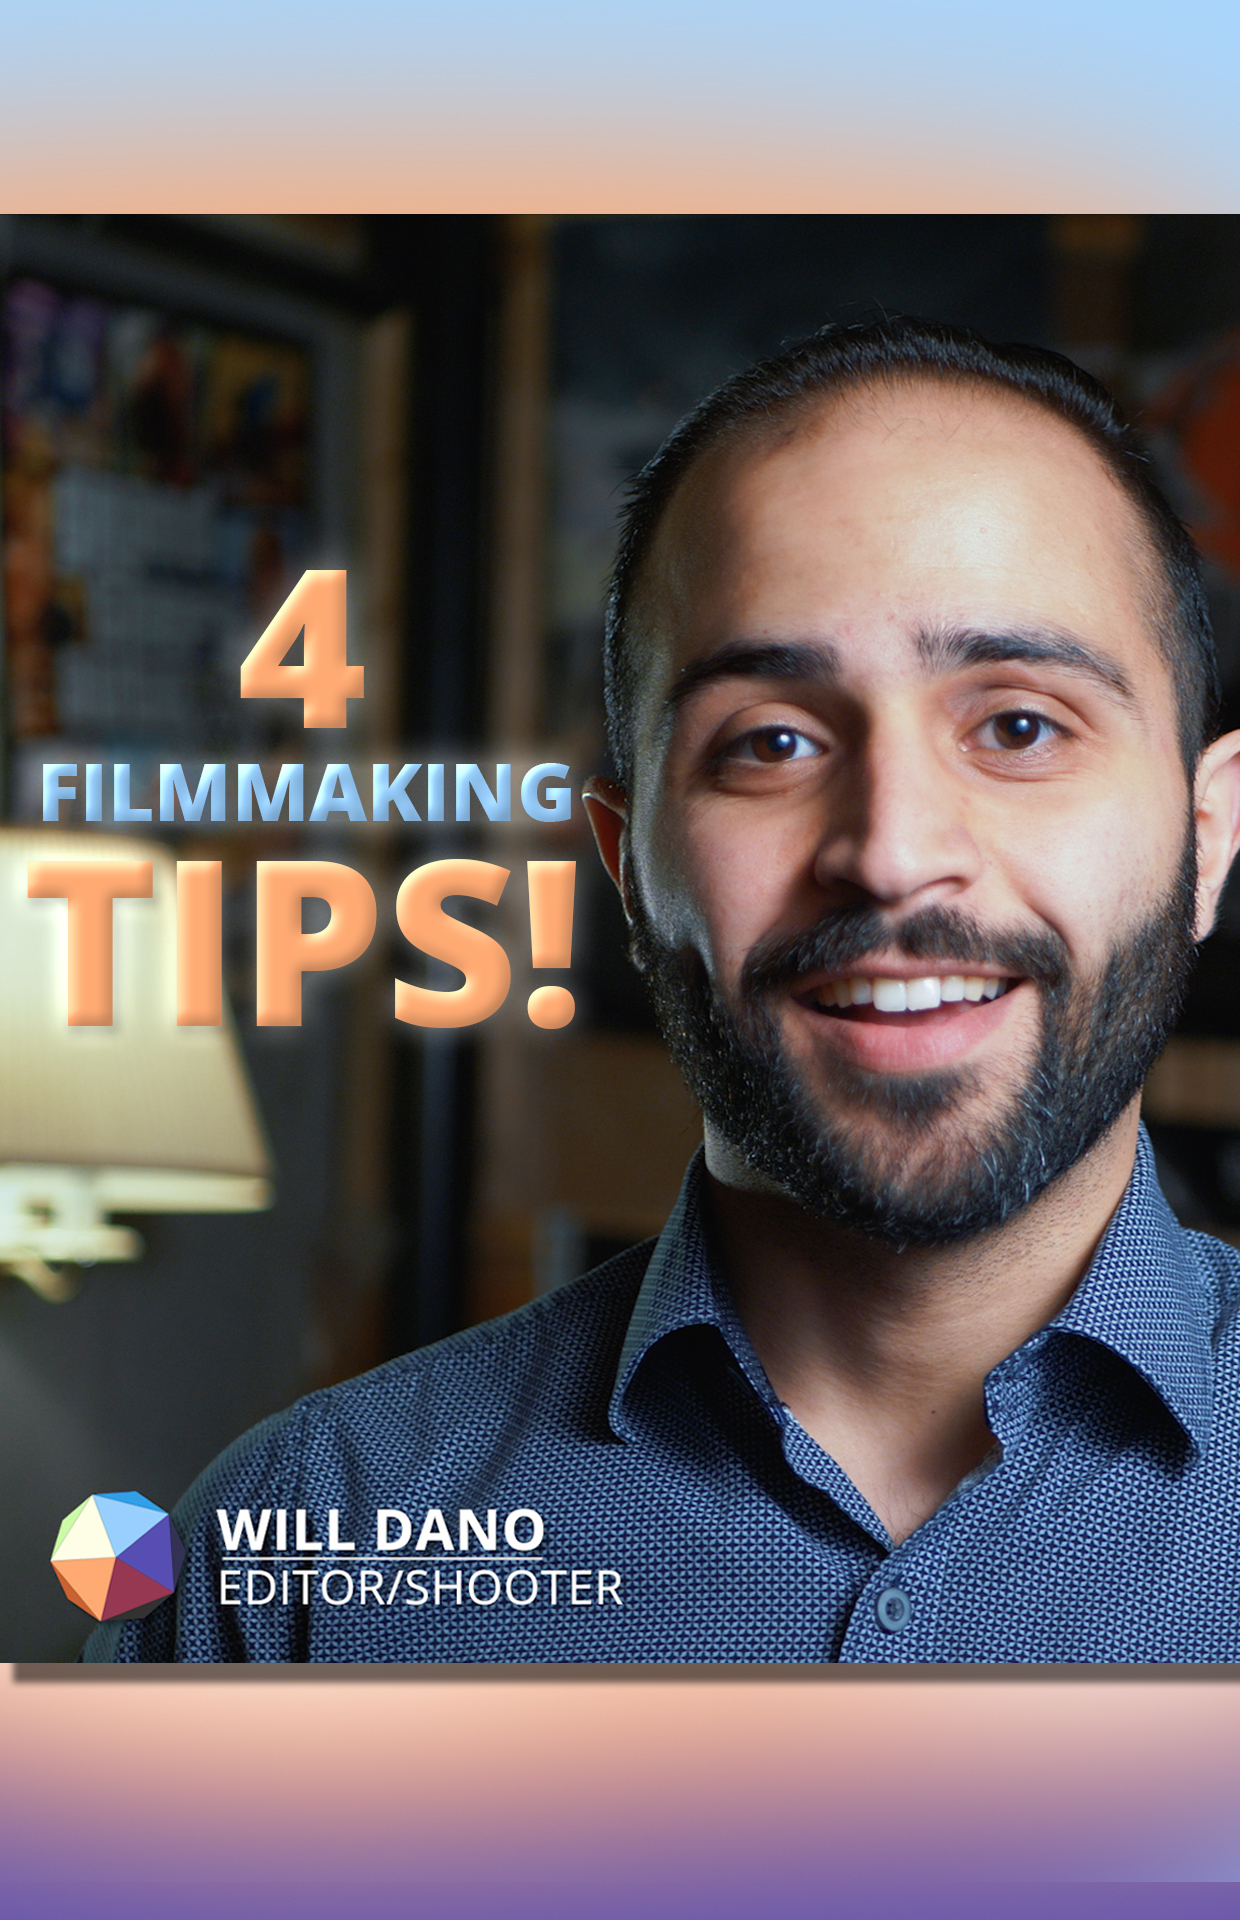 Filmmaking Tips